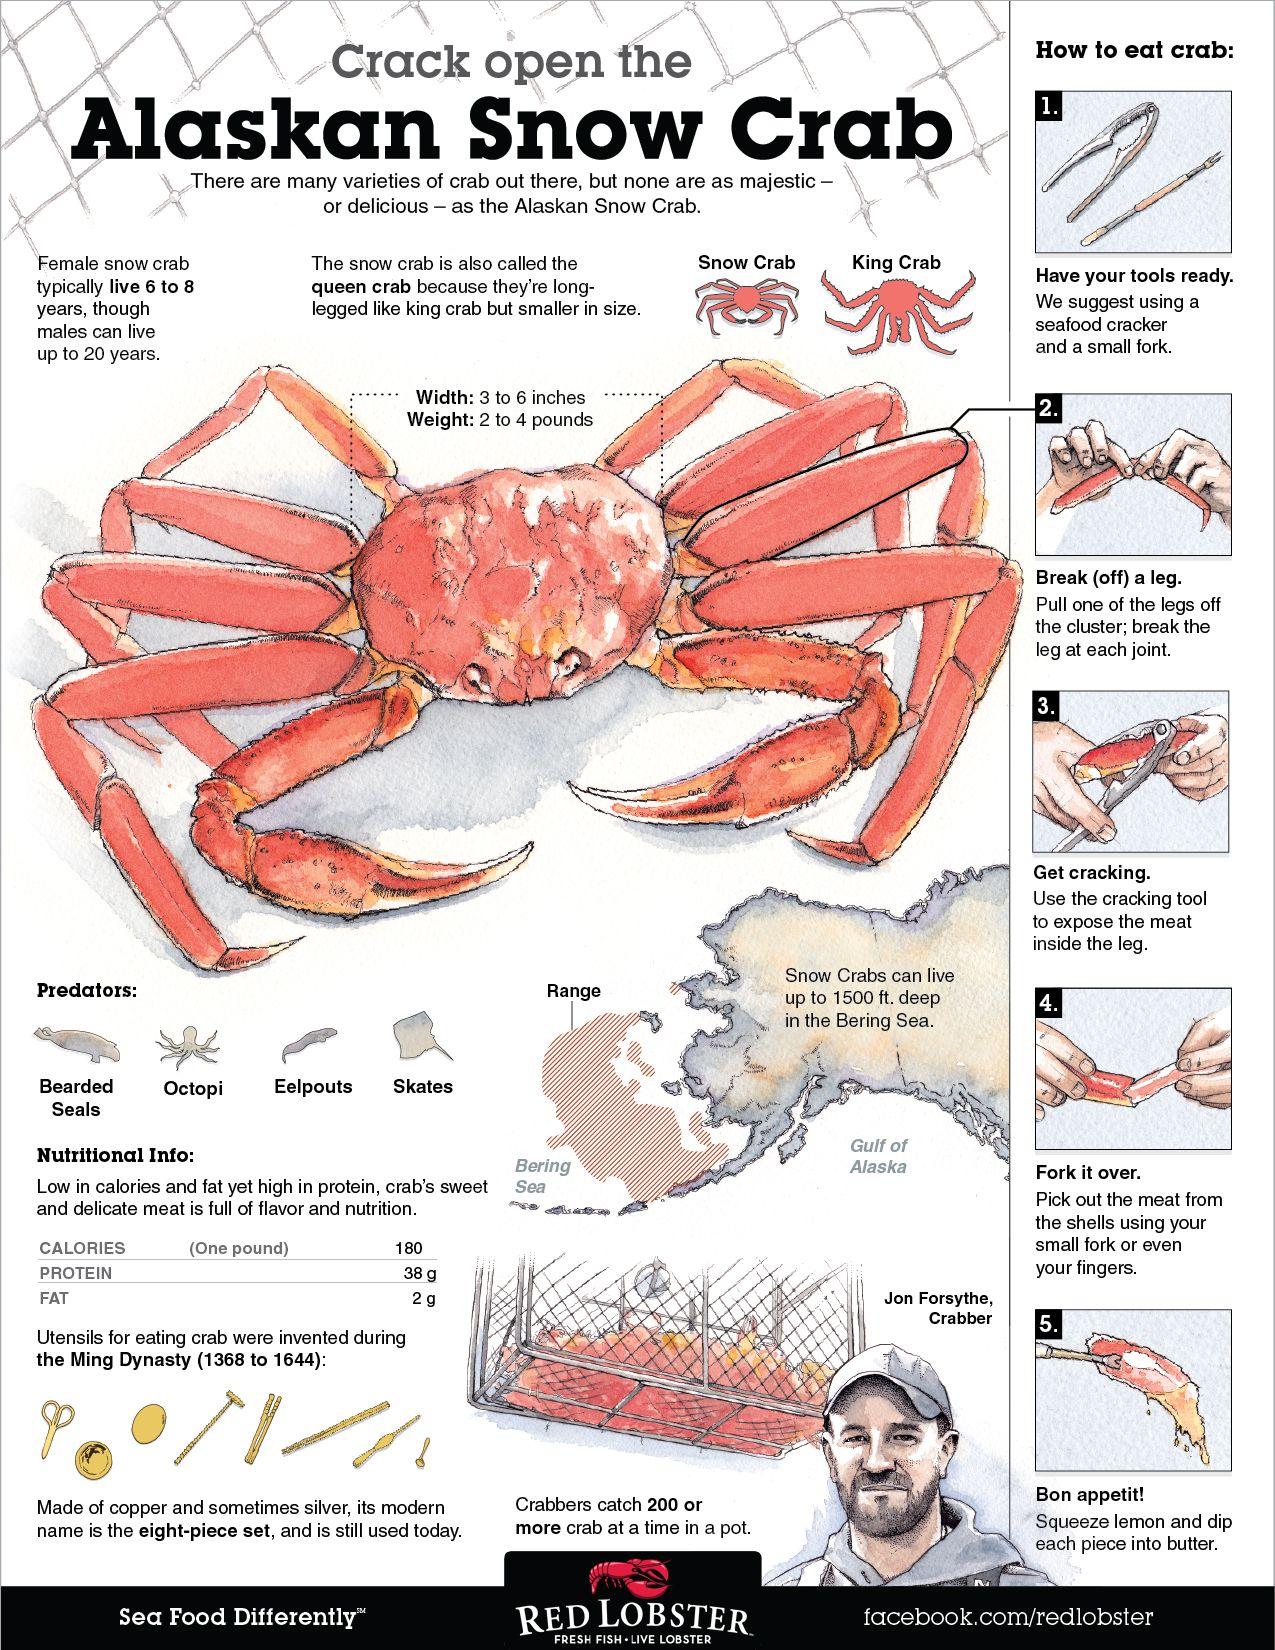 How To Eat Crab Visual Ly Alaskan Snow Crab Crab Crab Recipes